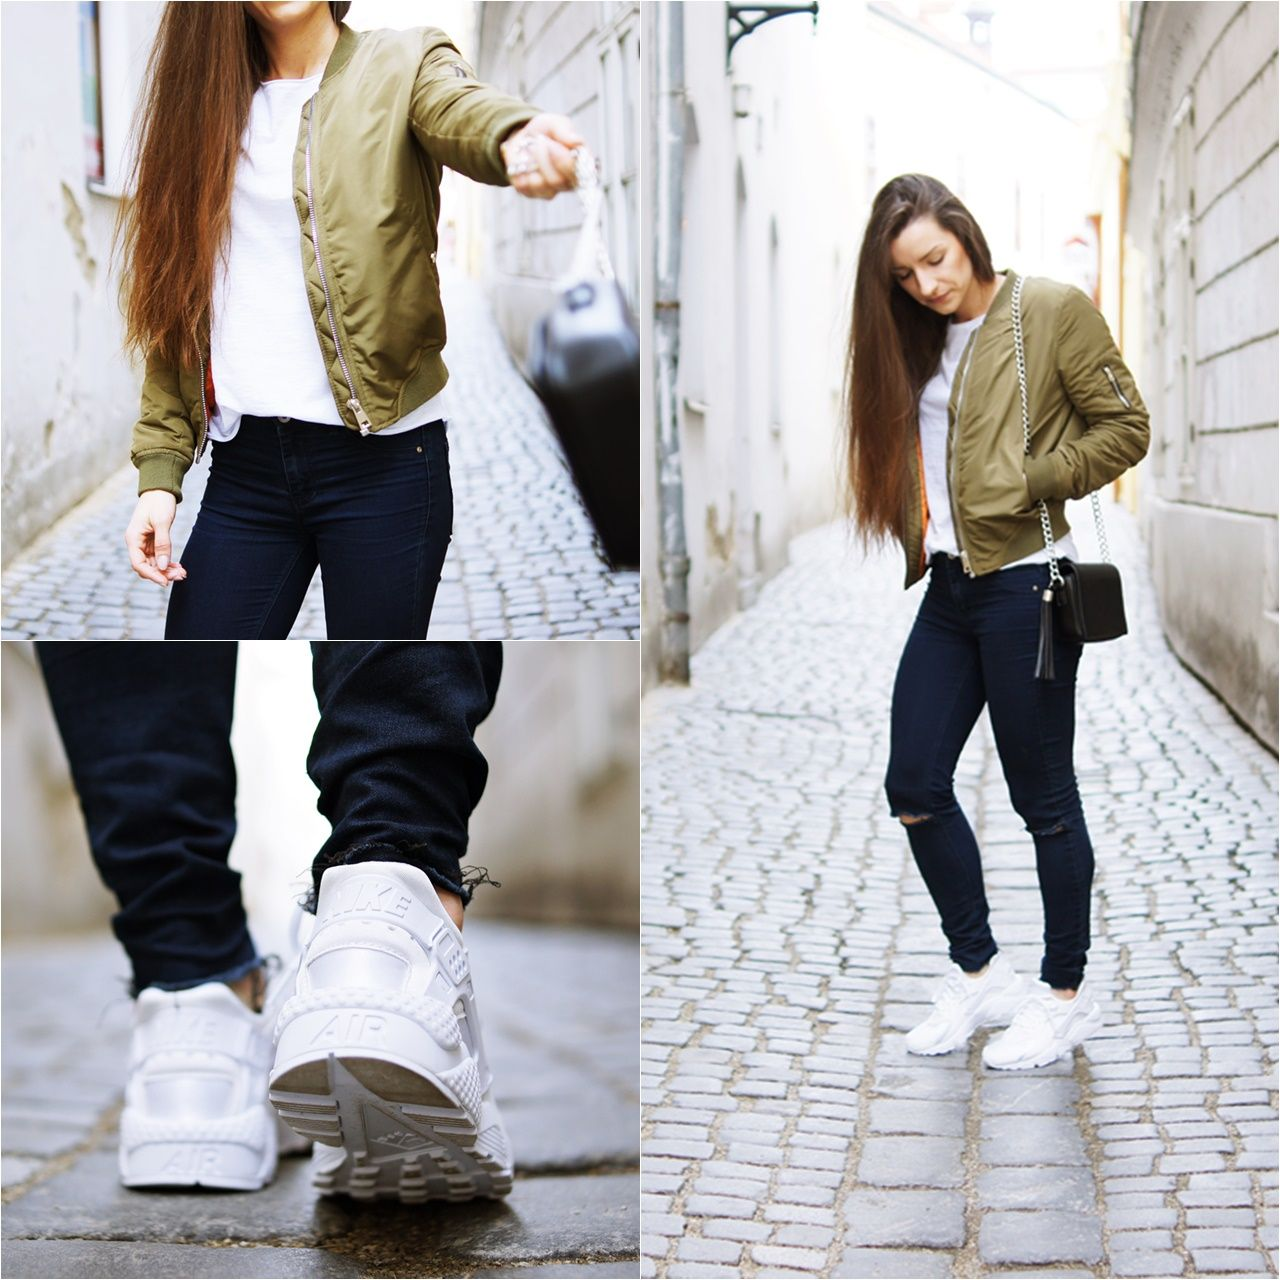 d1b46b8db808 ... shoes and nike rosh  bomber jacket nike air huarache http  ajmissindependent.blogspot